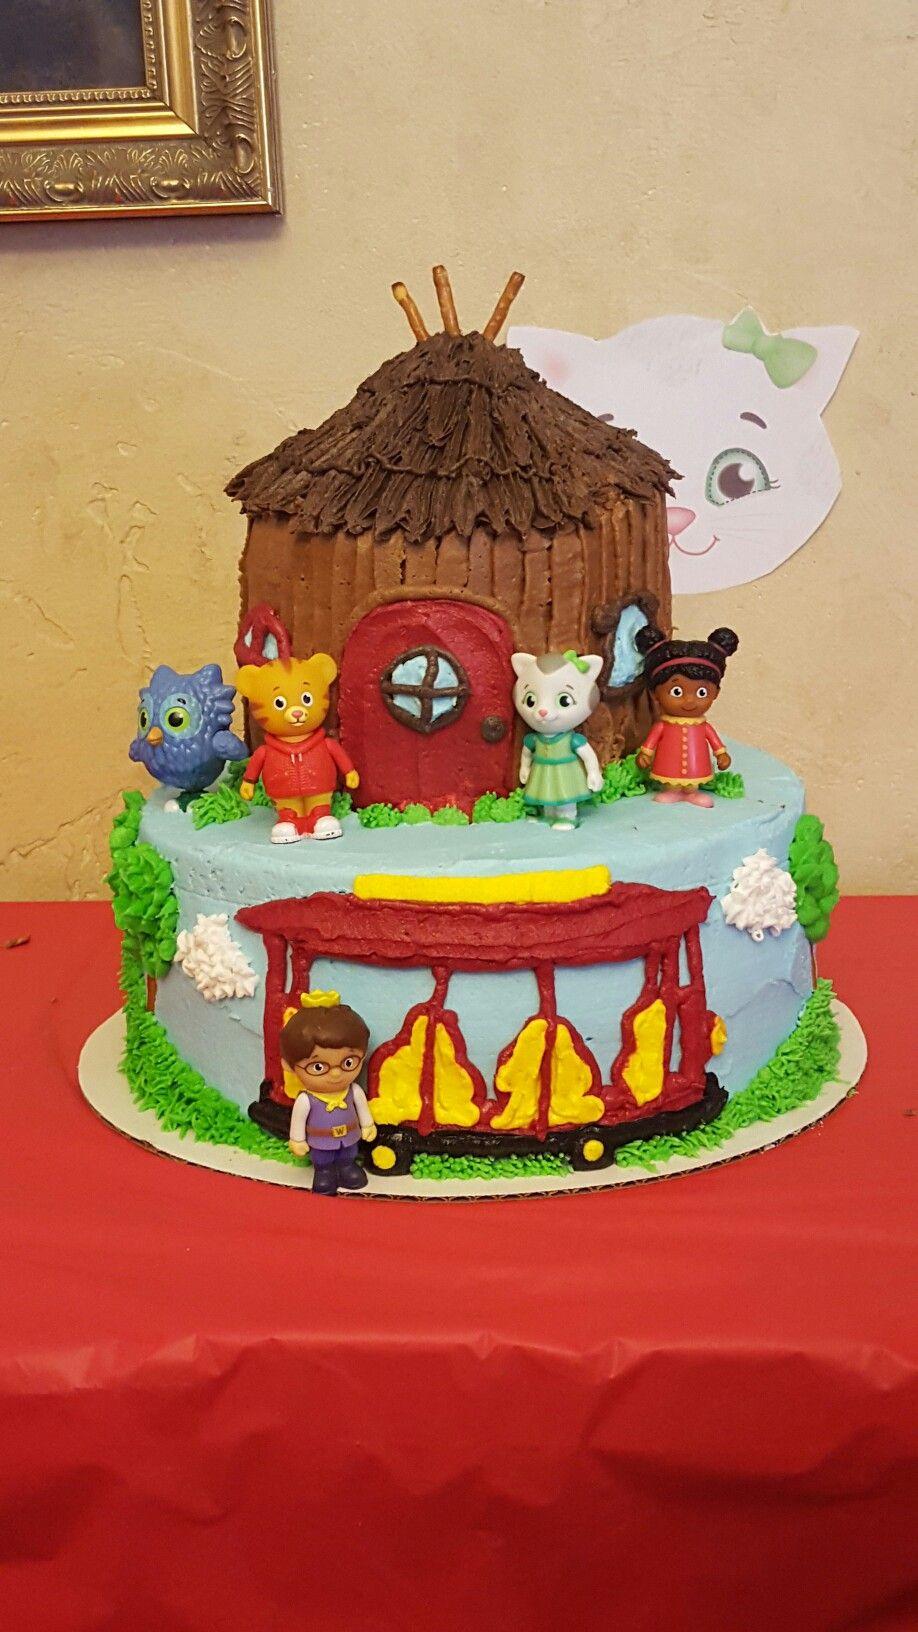 Eastons Cake Daniel Tiger Tier Cake Done In Buttercream